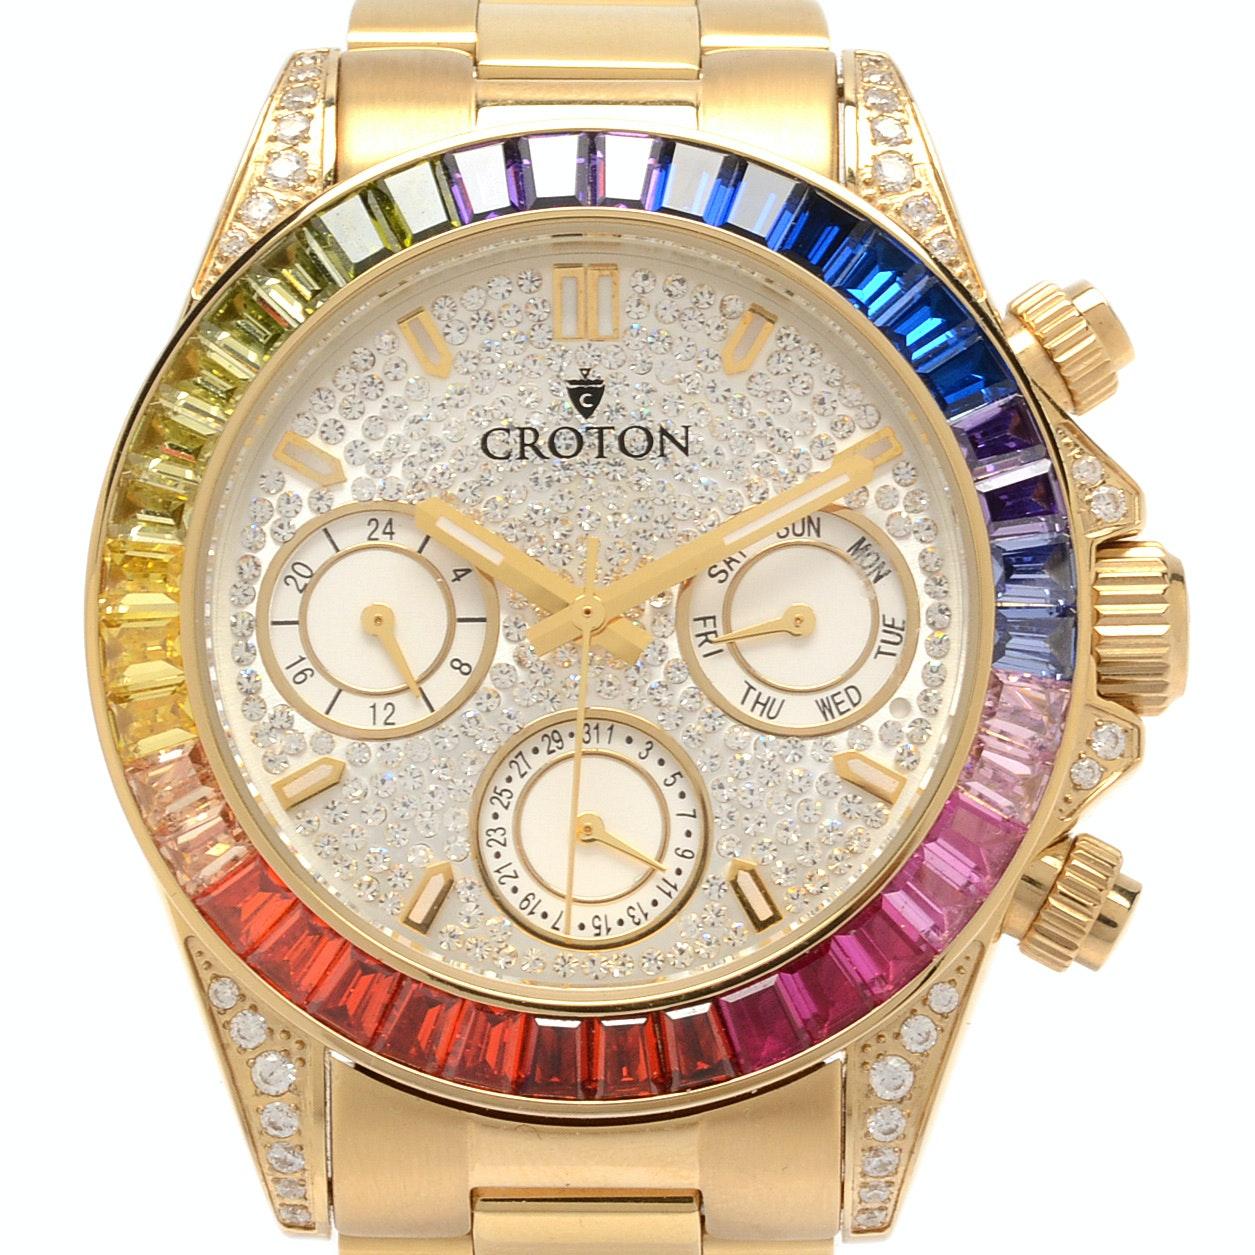 Croton Chronometer Wristwatch with Multicolored Gemstone Bezel